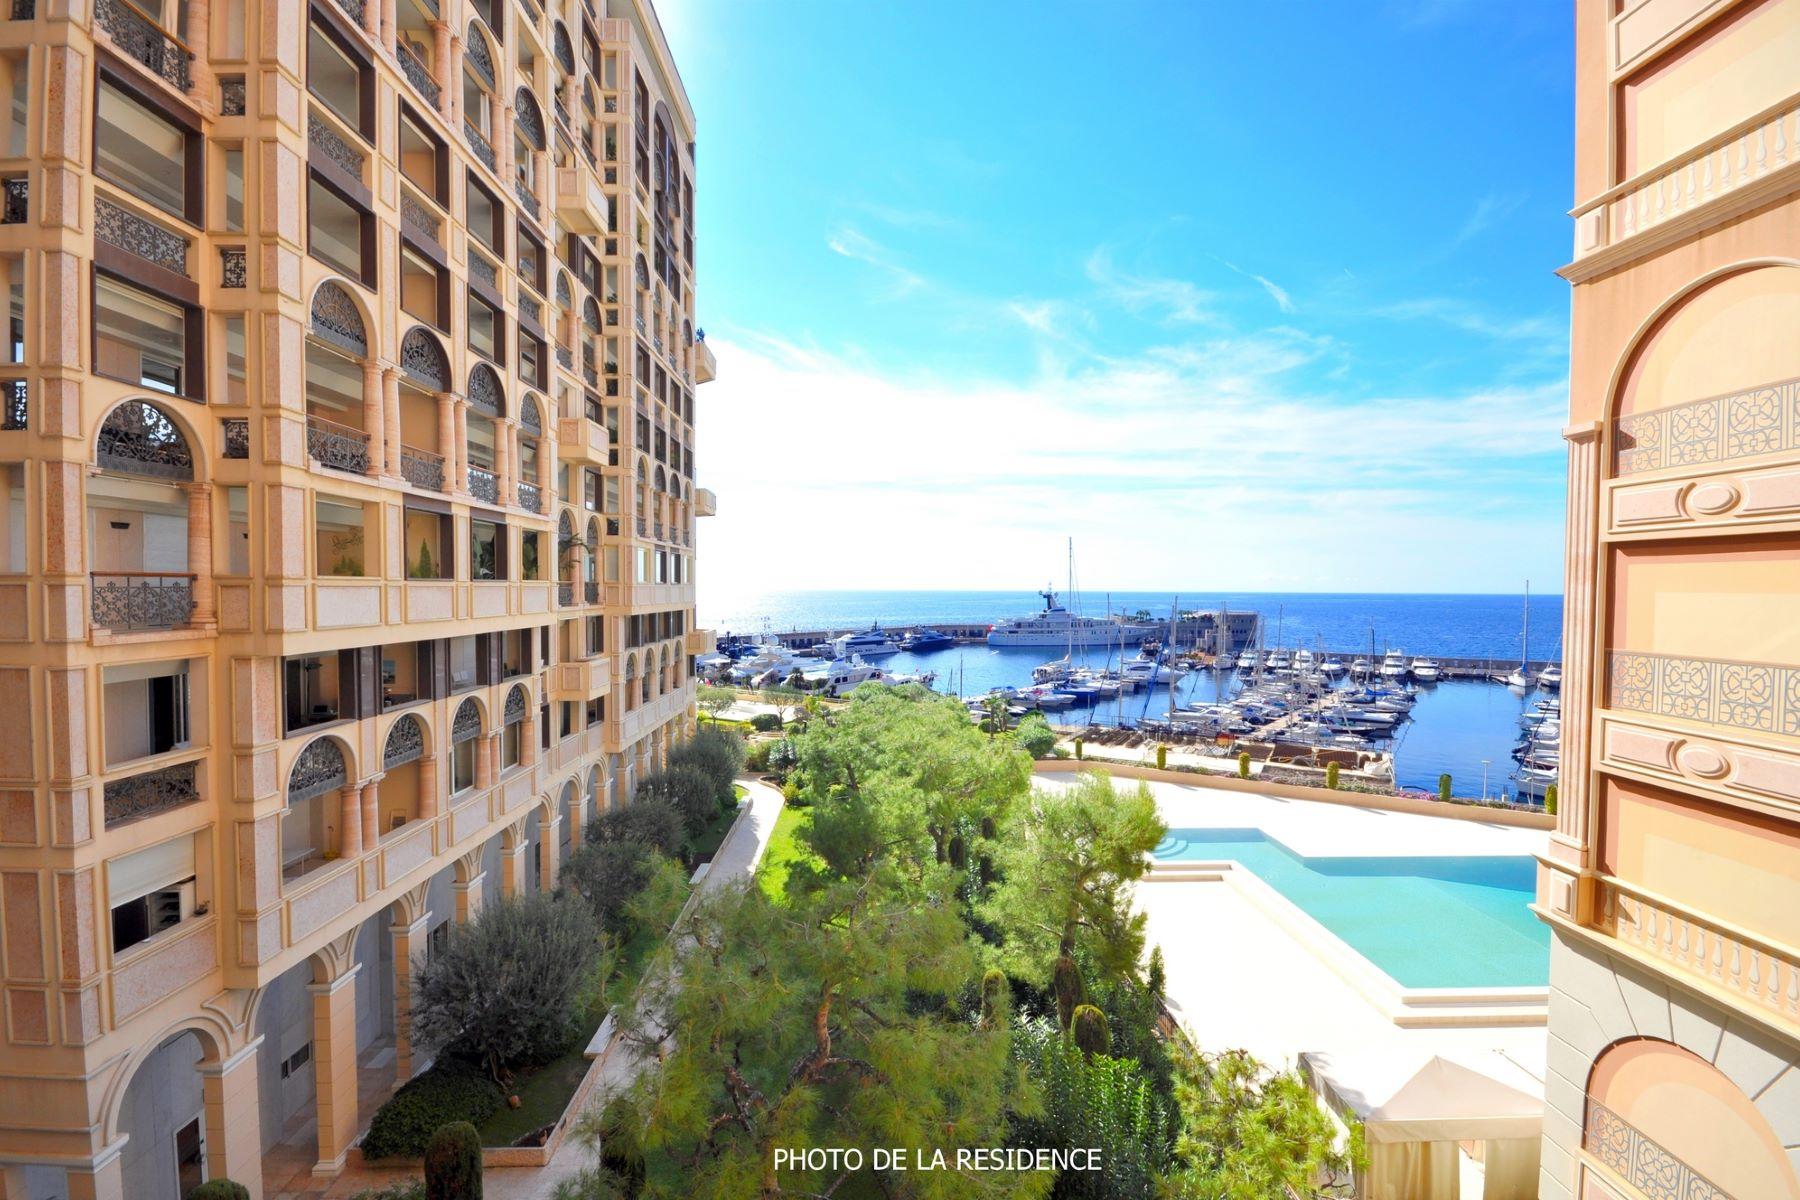 可出售的物业 Monaco